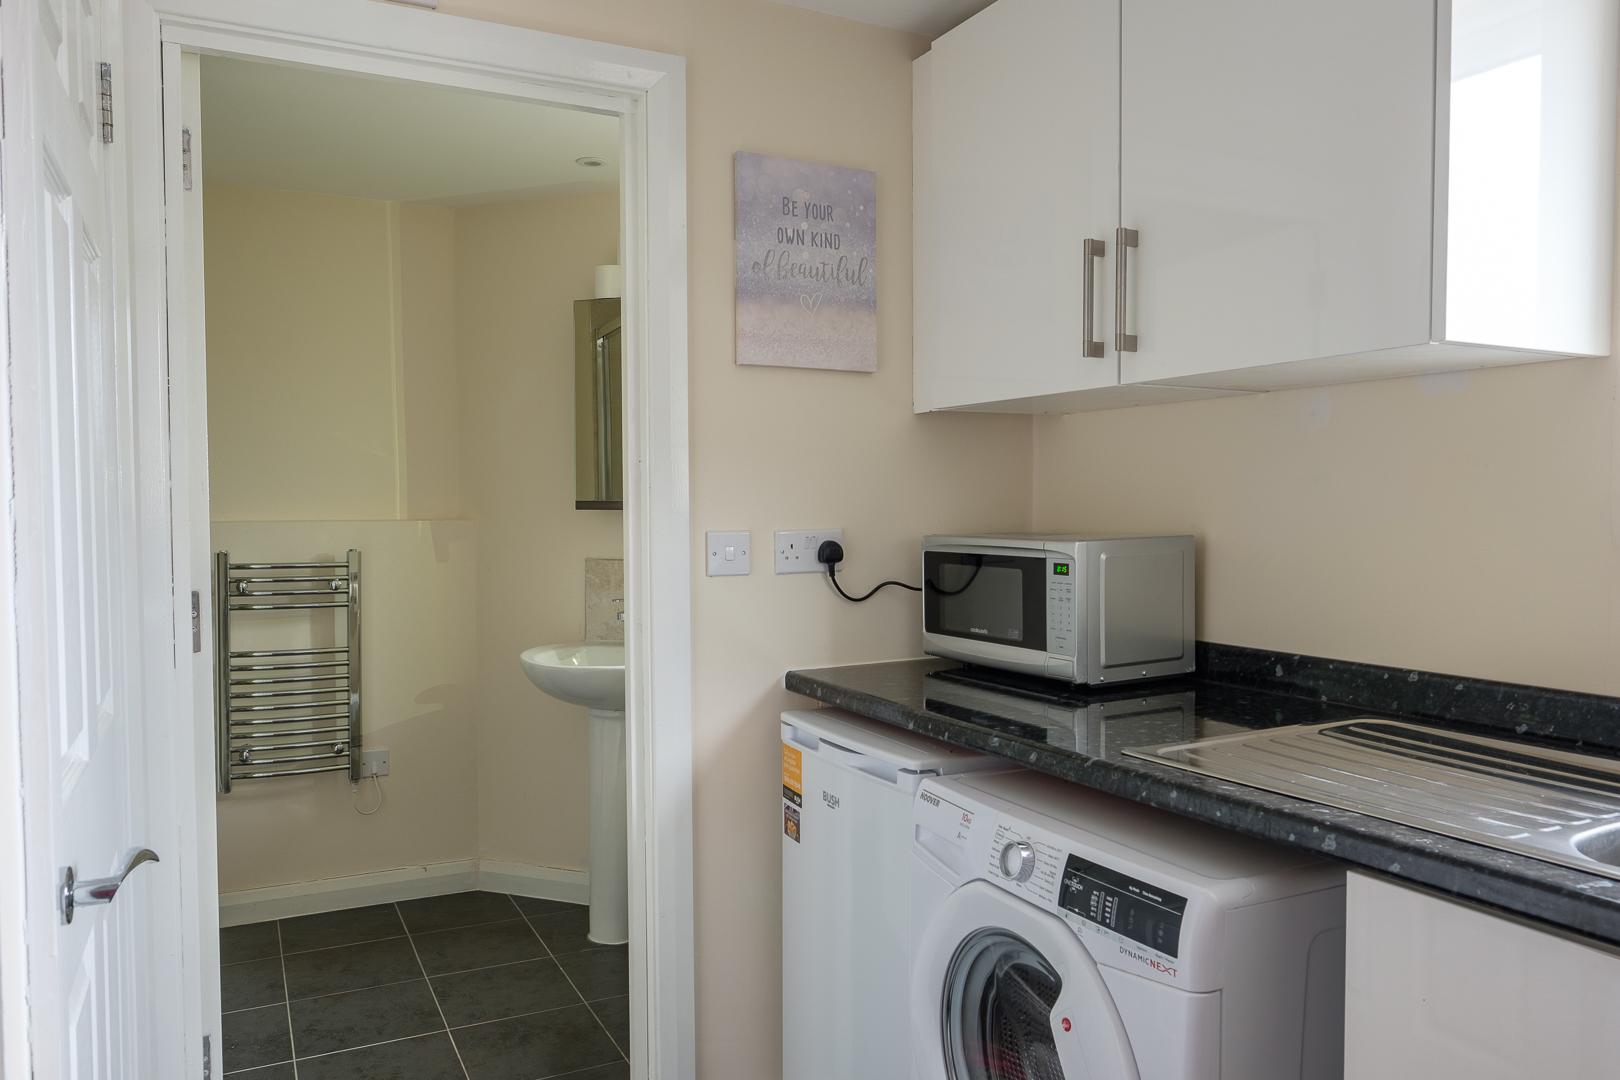 Washing machine at Broadwalk Apartment, Centre, Crawley